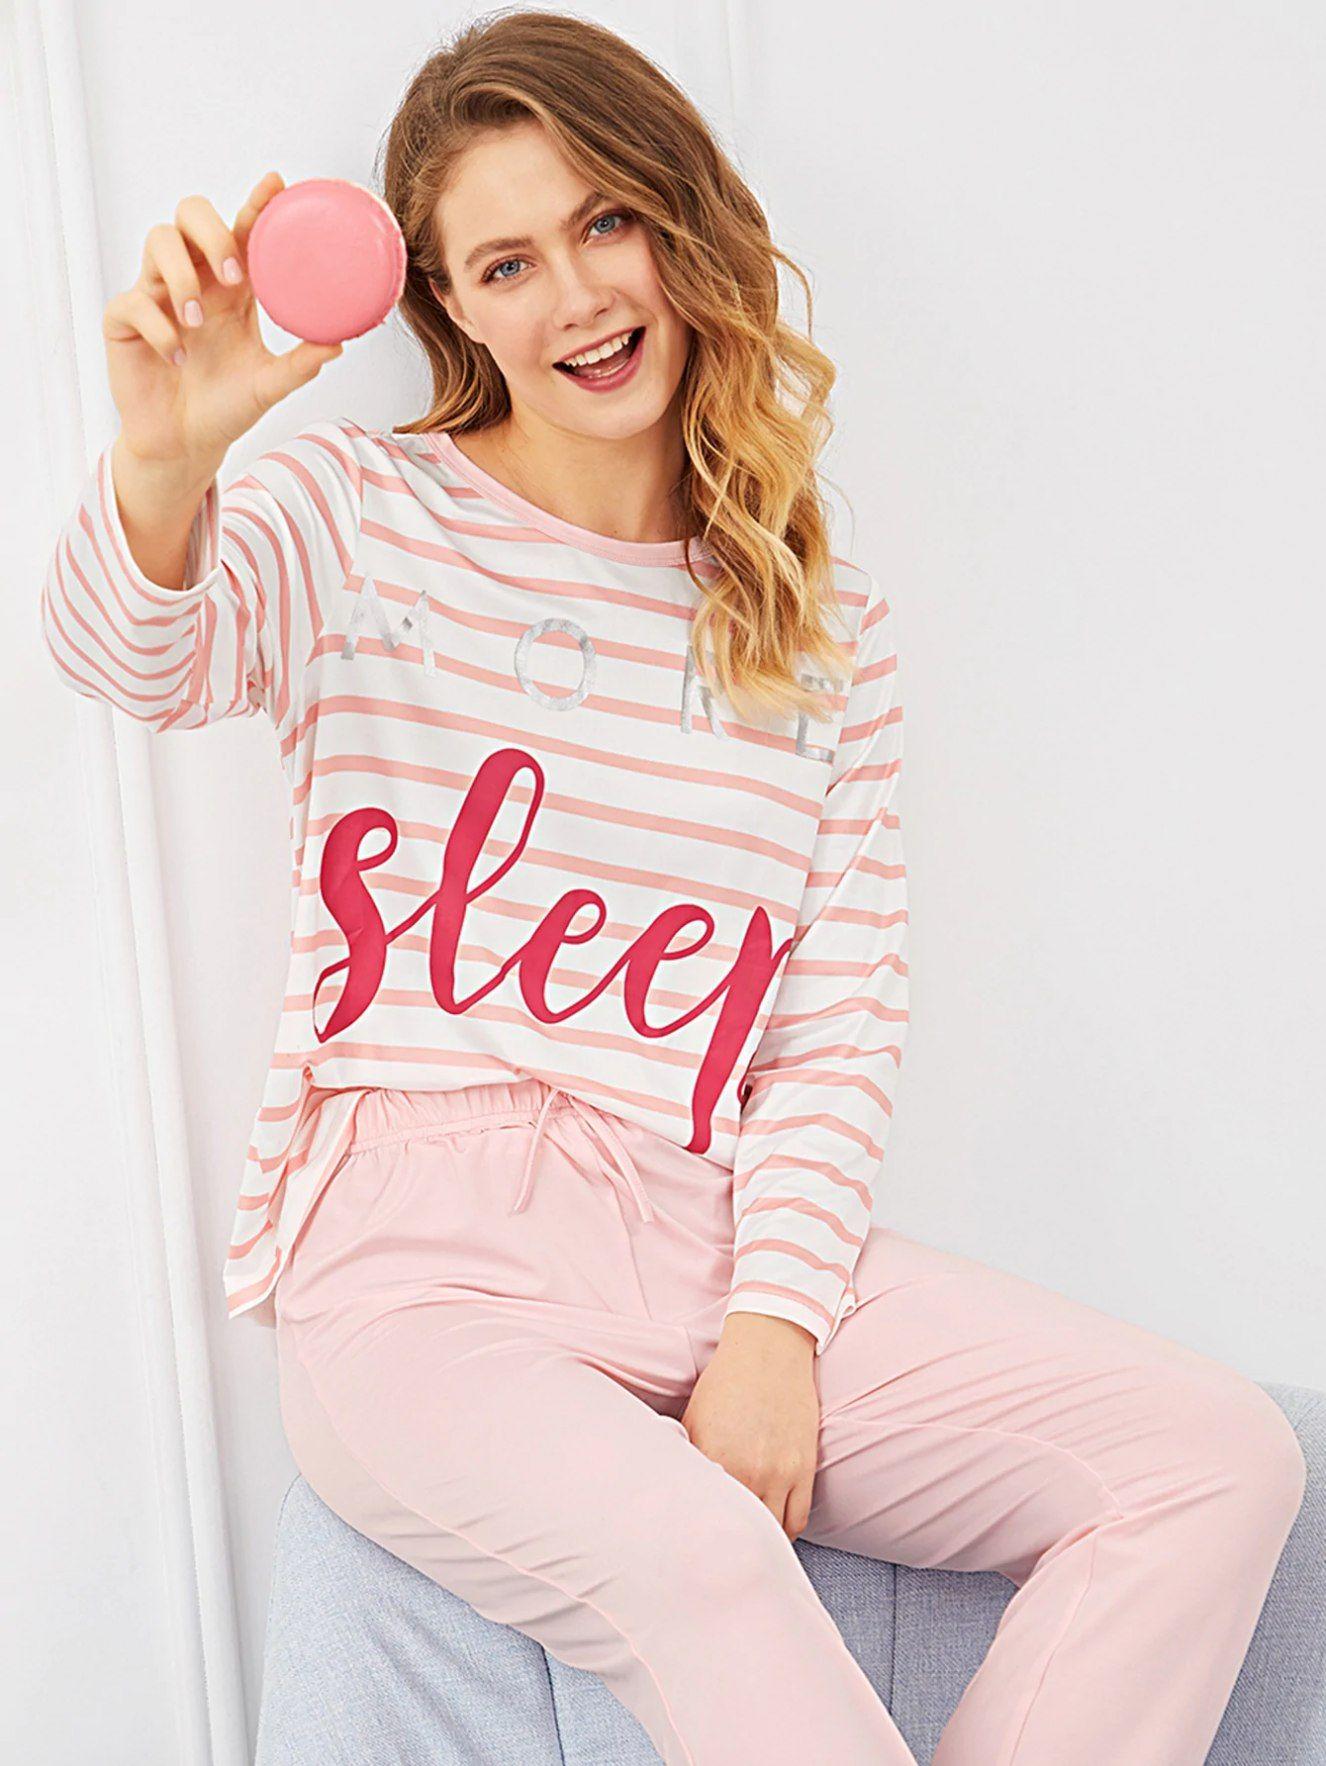 a6eef44eb3 $18 - Letter Print Striped Pajama Set - Loungewear #pajama #letter  #loungewear